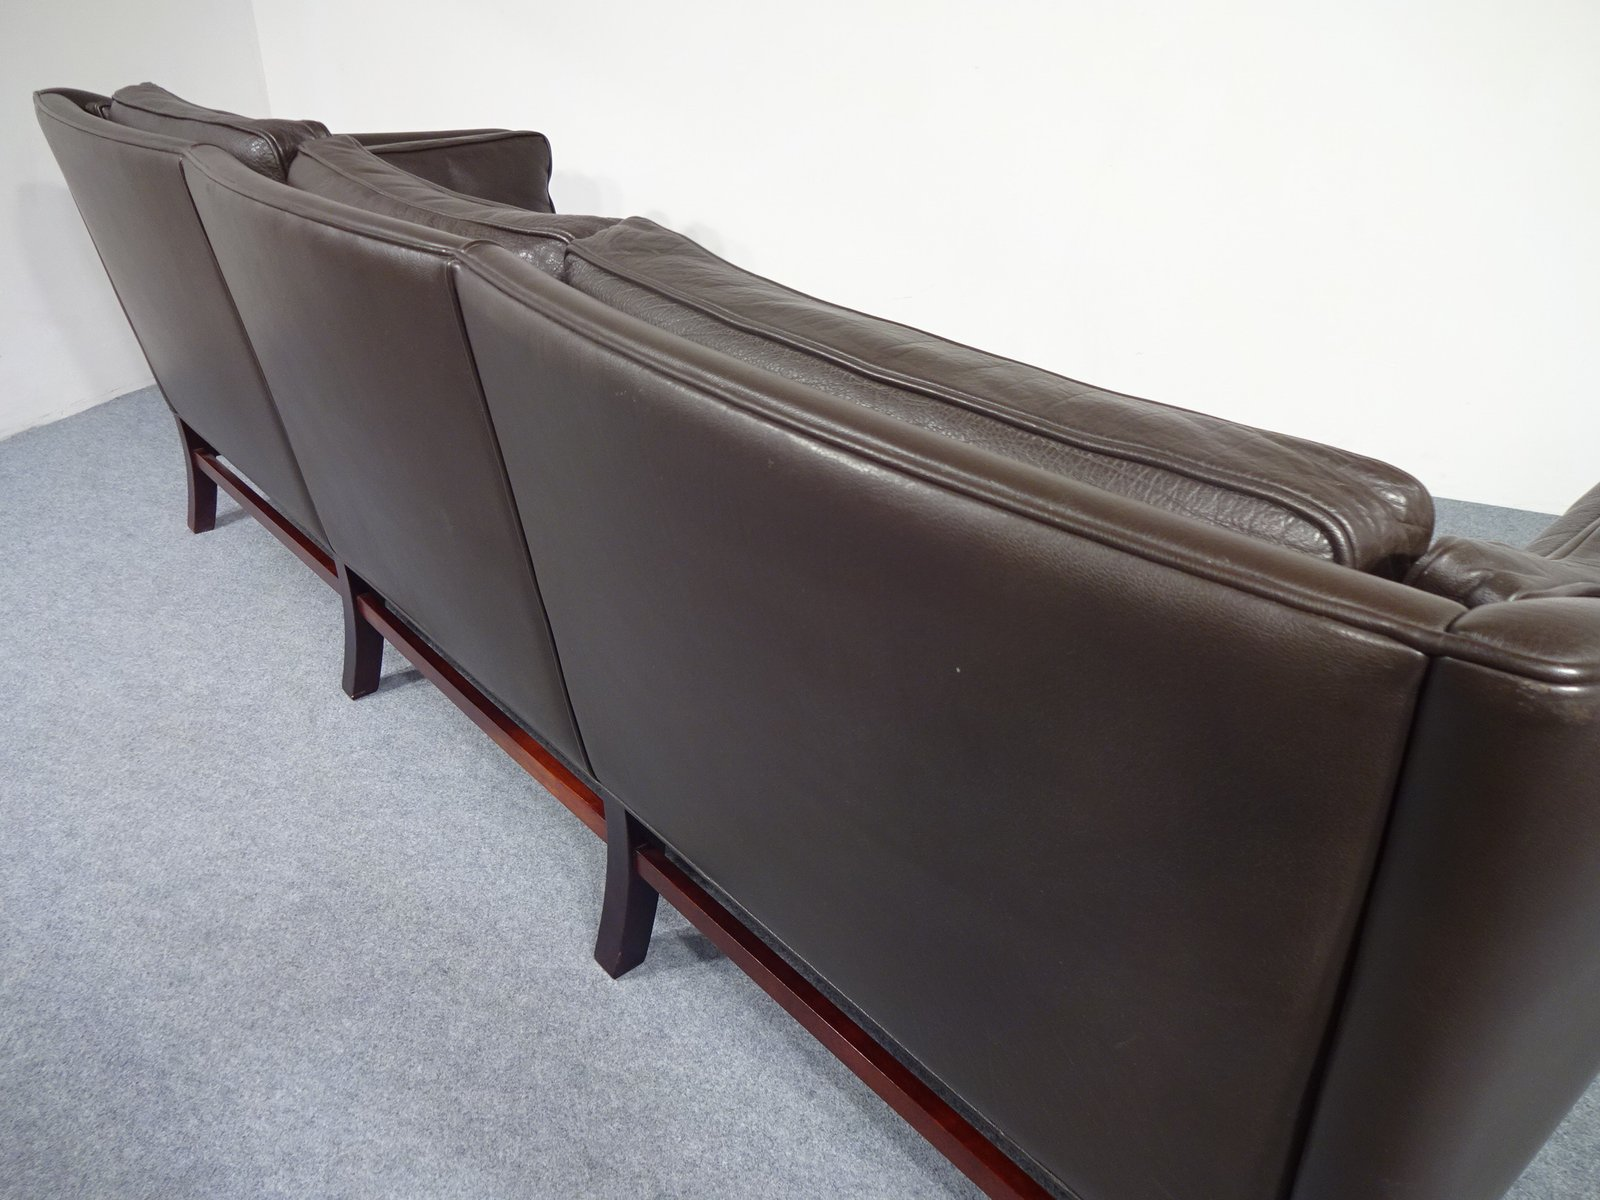 d nisches vintage ledersofa von georg thams f r vejen polsterm belfabrik 1970er bei pamono kaufen. Black Bedroom Furniture Sets. Home Design Ideas